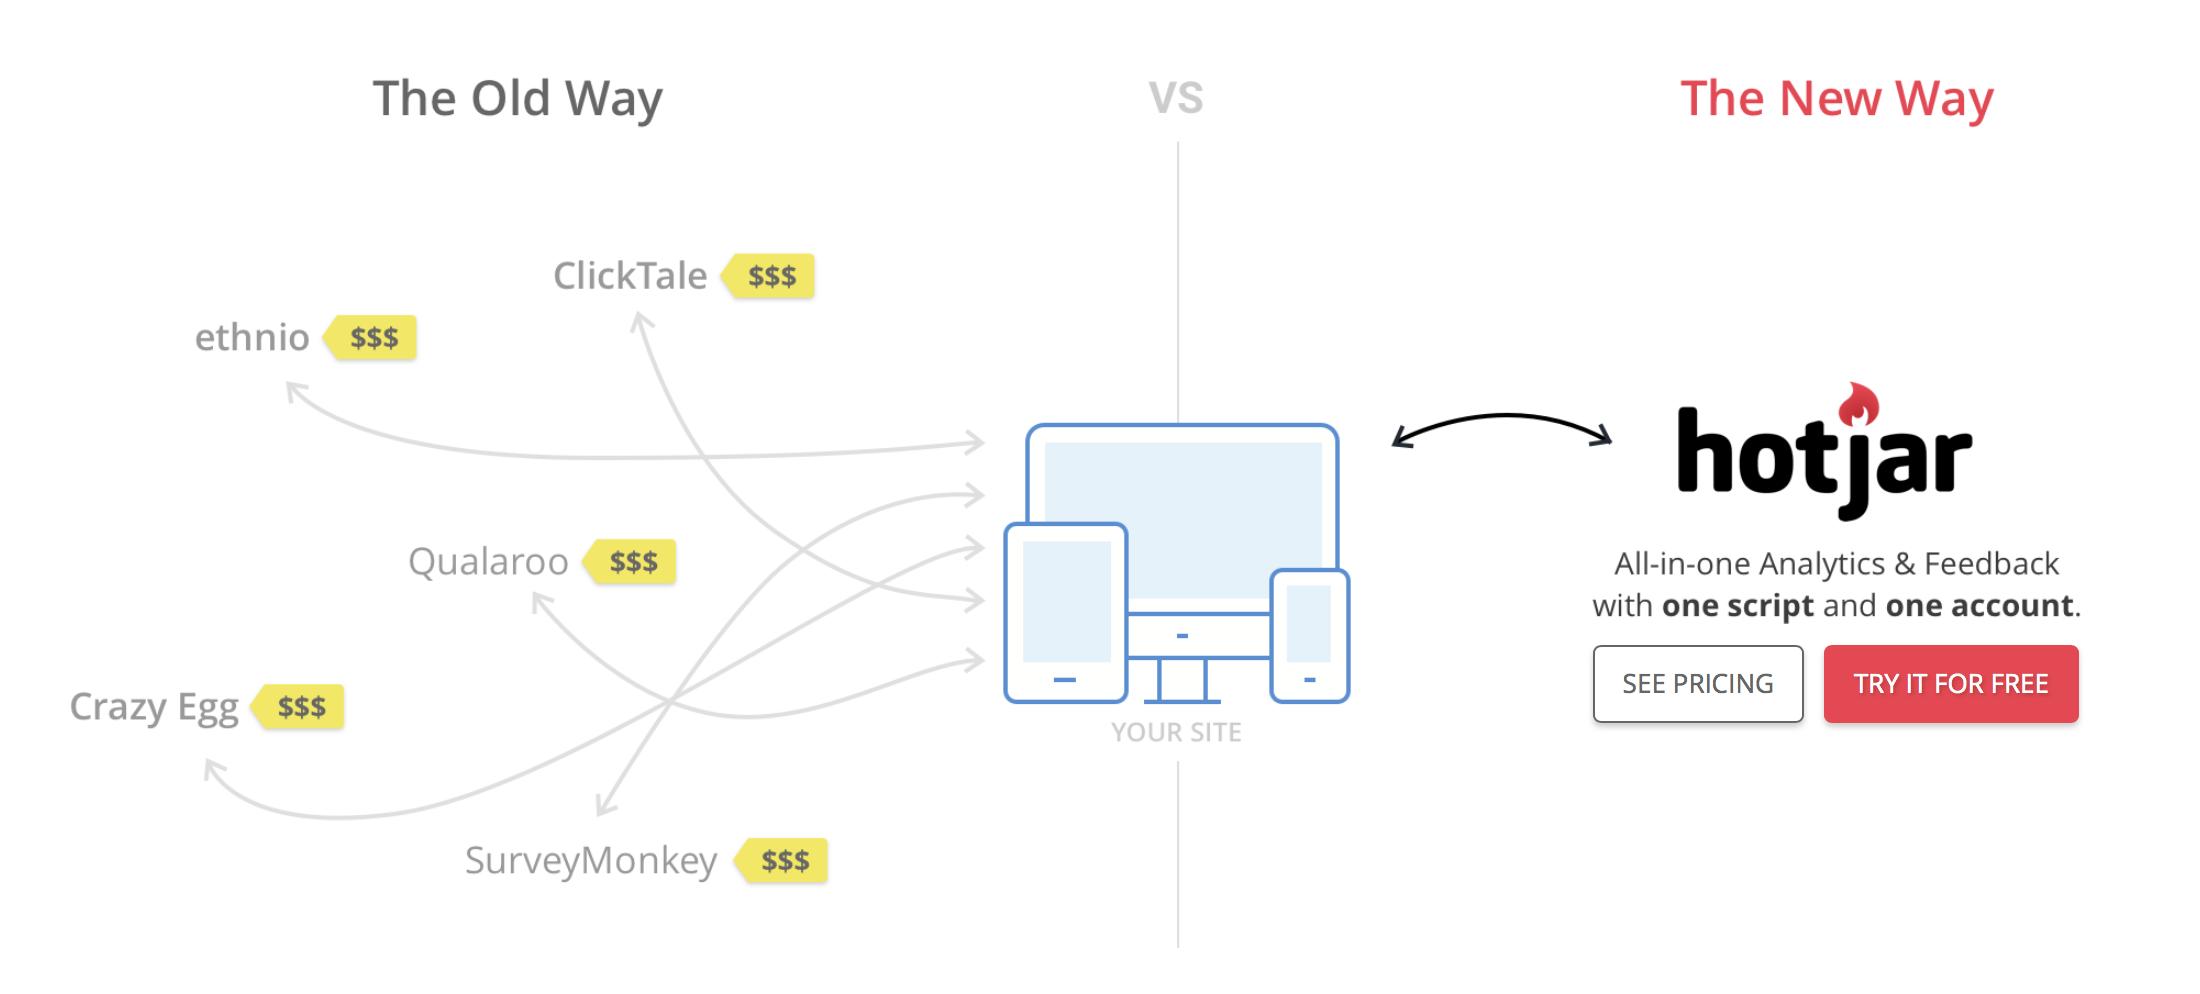 hotjar به کارآفرینان کمک می کند تا عملکرد کاربران را بر روی سایت خود آنلایز کنند